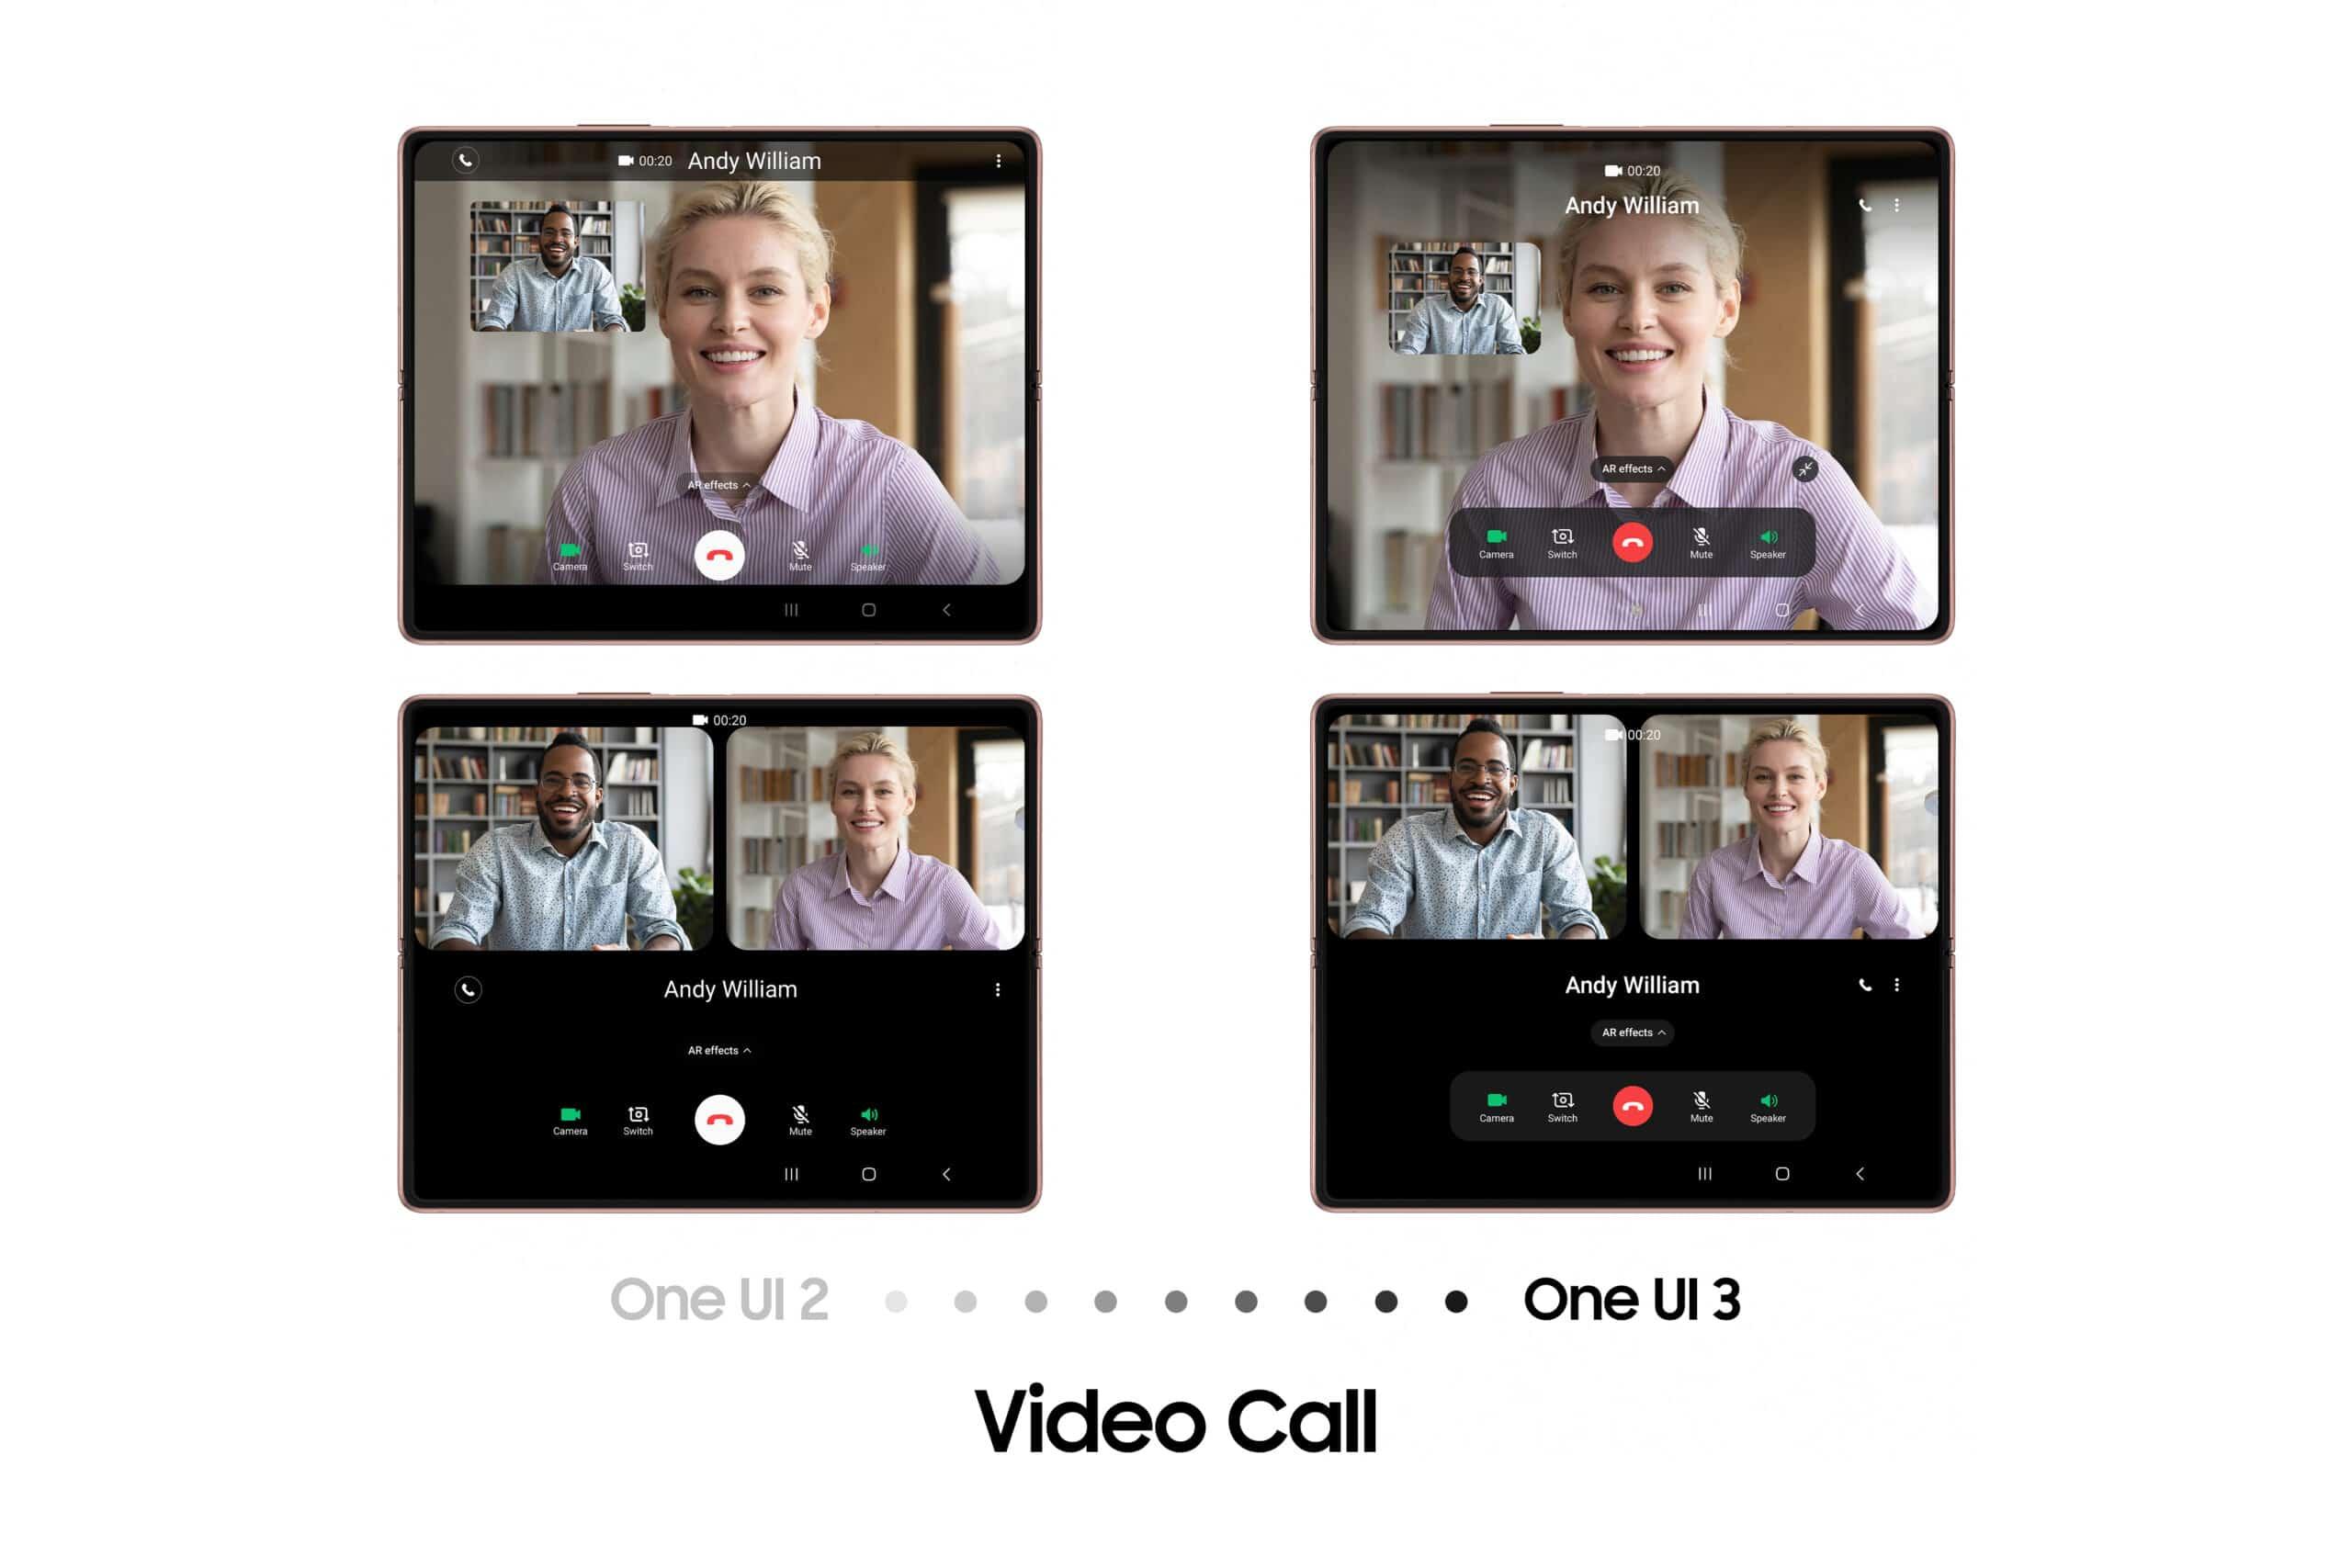 galaxy z fold2 video call